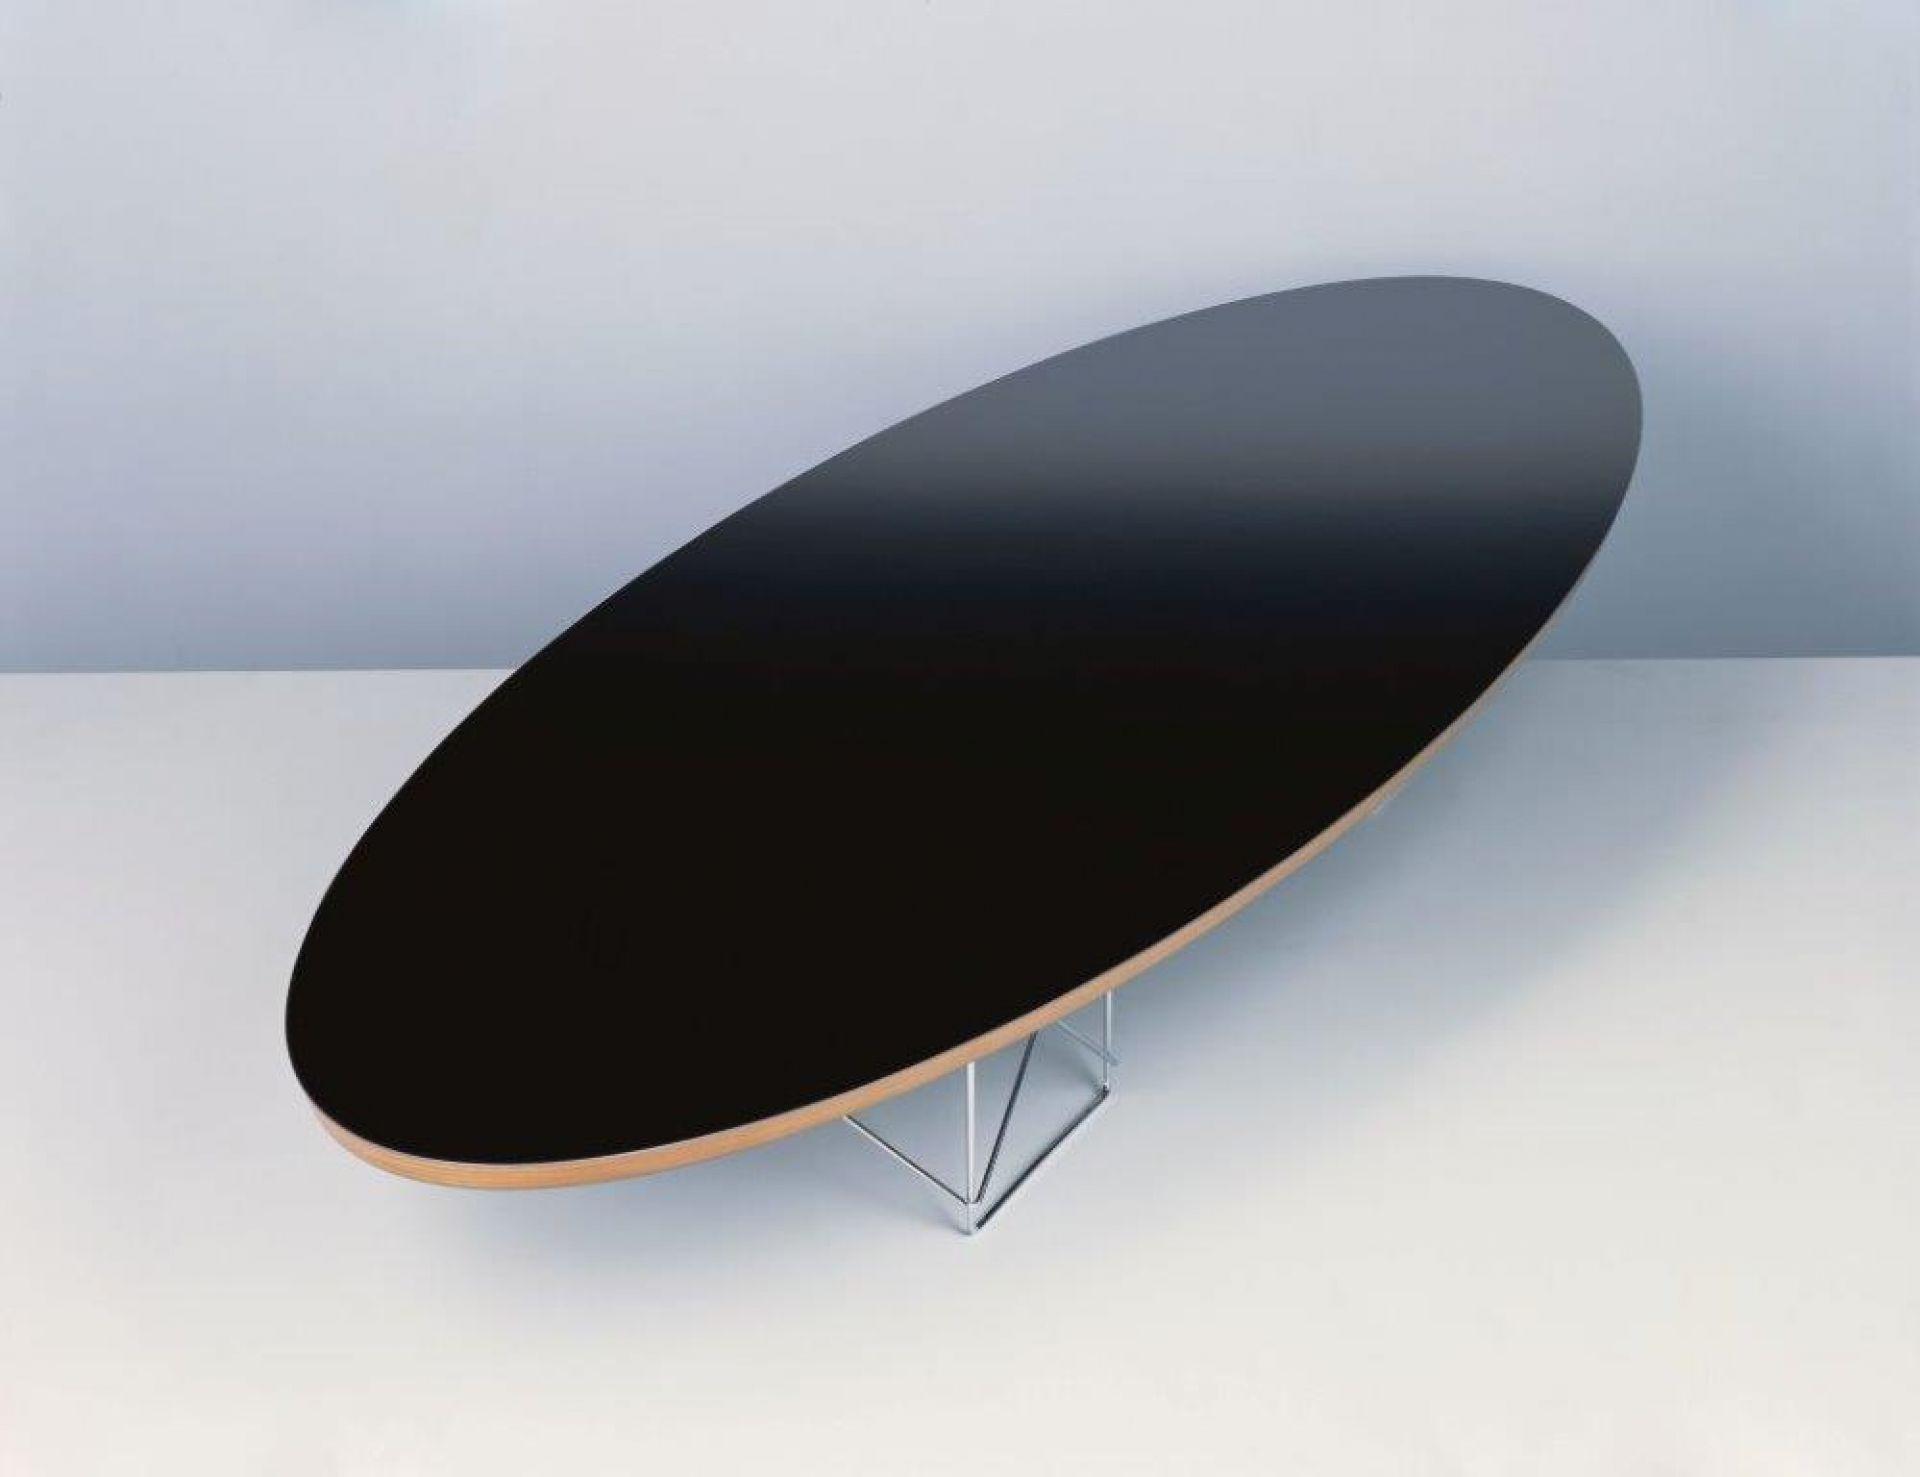 Elliptical Table ETR Eames Tisch Vitra